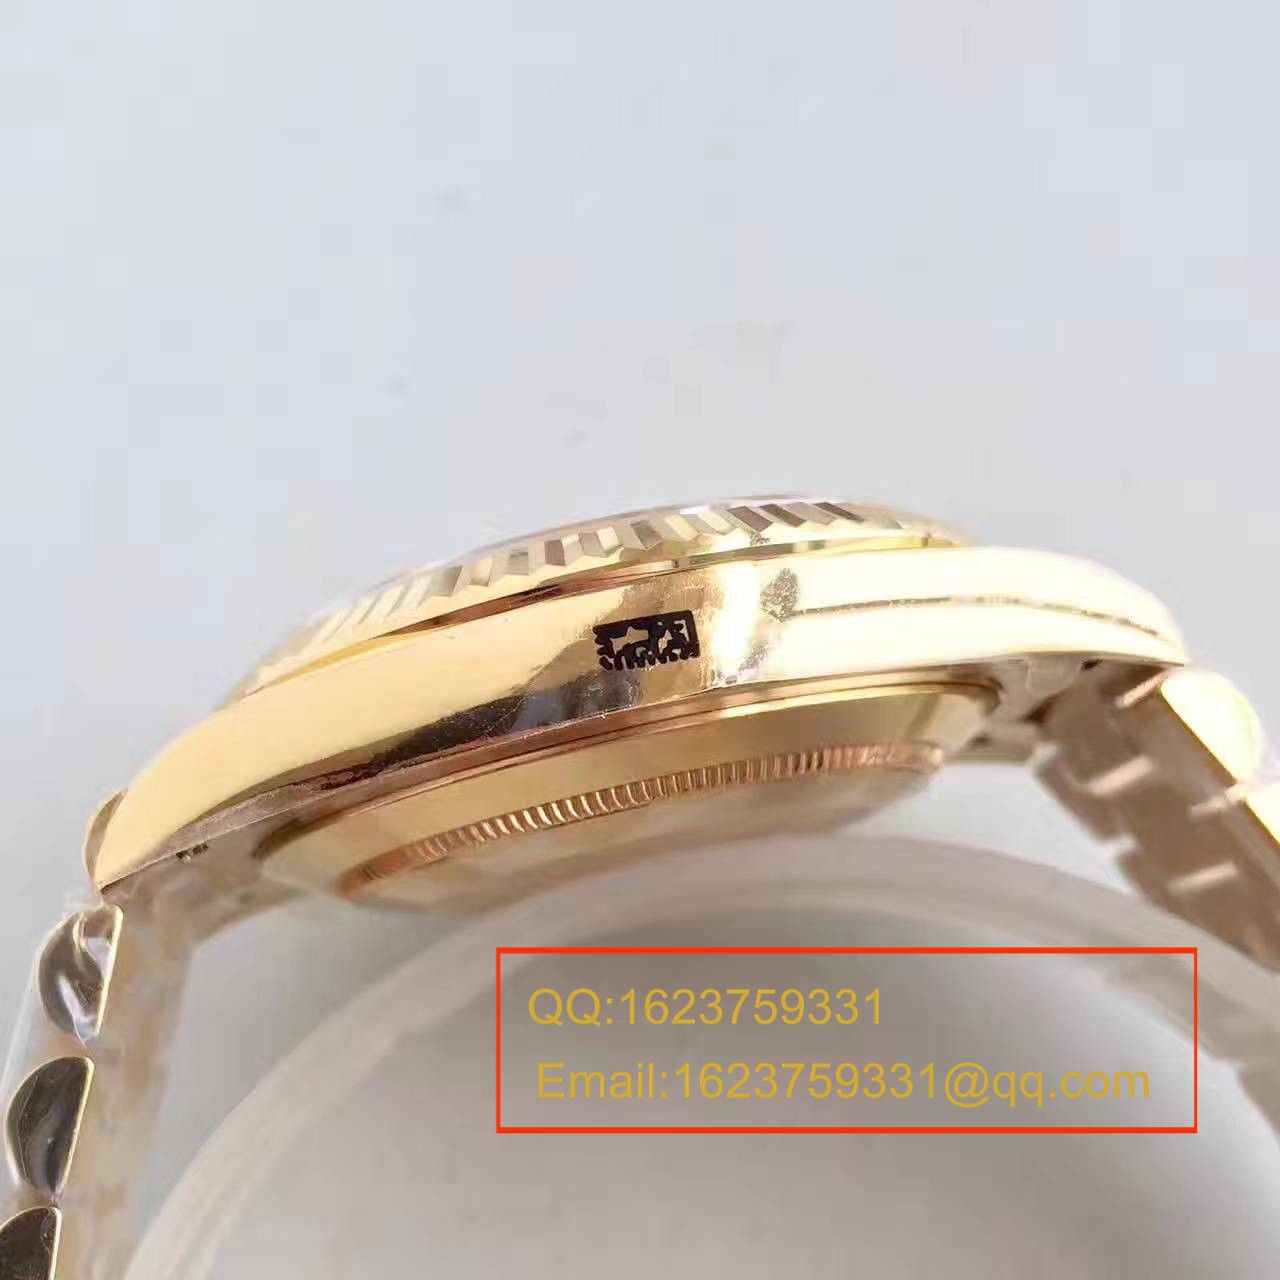 【NOOB厂一比一复刻手表】劳力士星期日历型系列218238-83218 白盘腕表 / RBE167